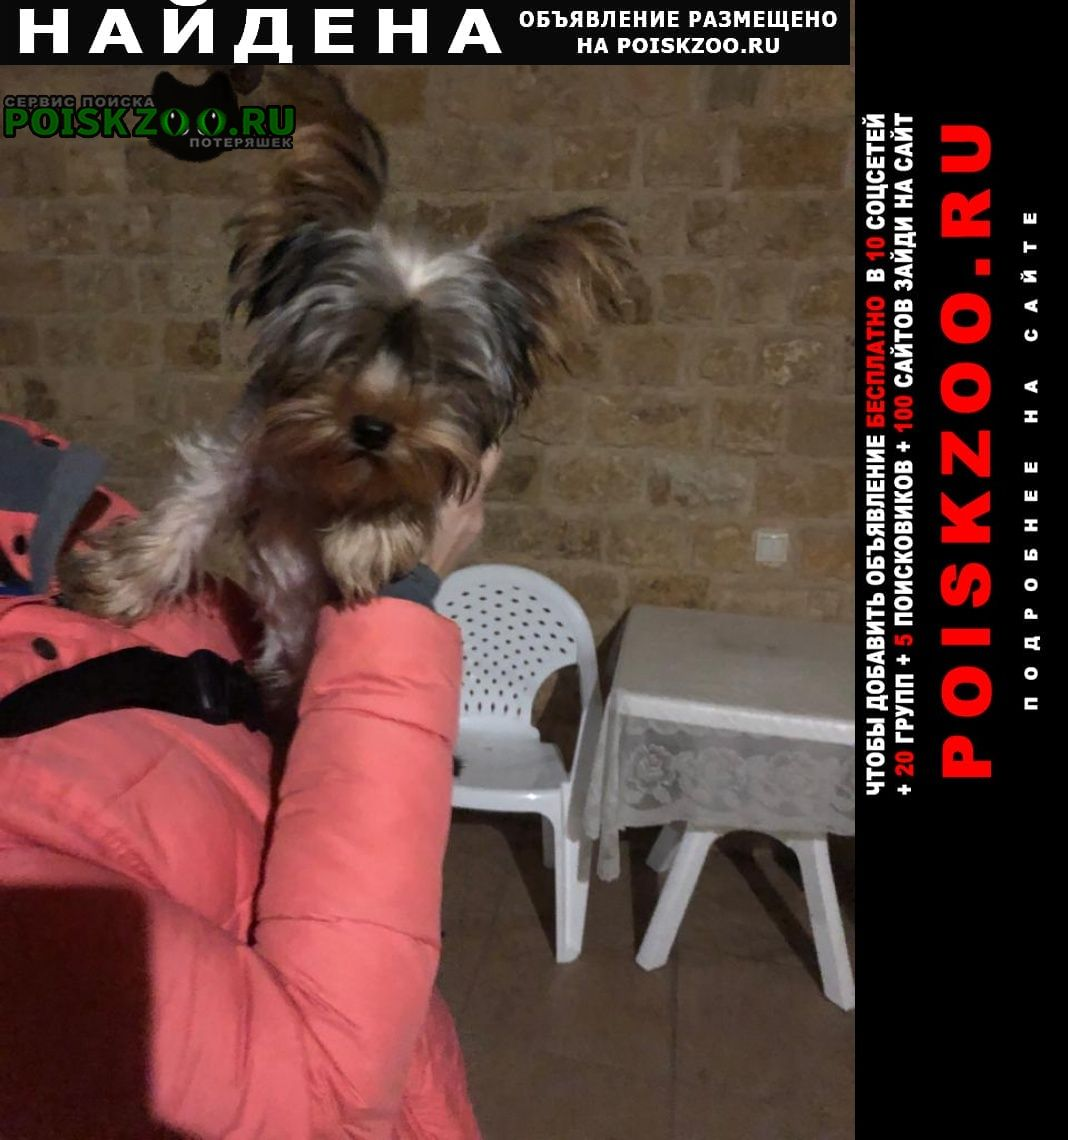 Найдена собака 2 февраля 21 г Адлер